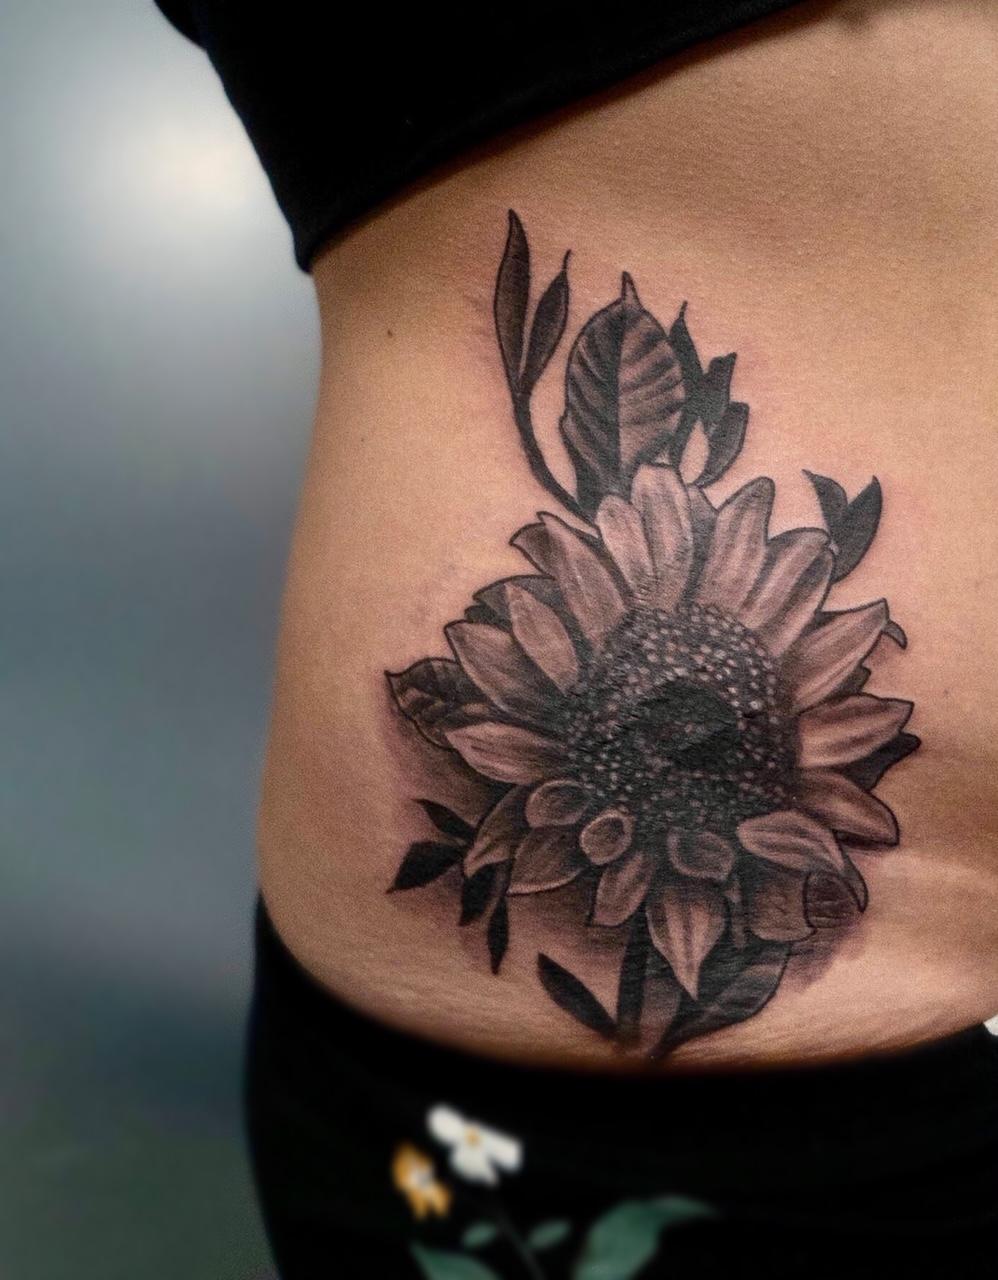 Custom Black and Grey Sunflower Tattoo by Ruben Trujillo at Certified Tattoo Studios Denver CO.jpg